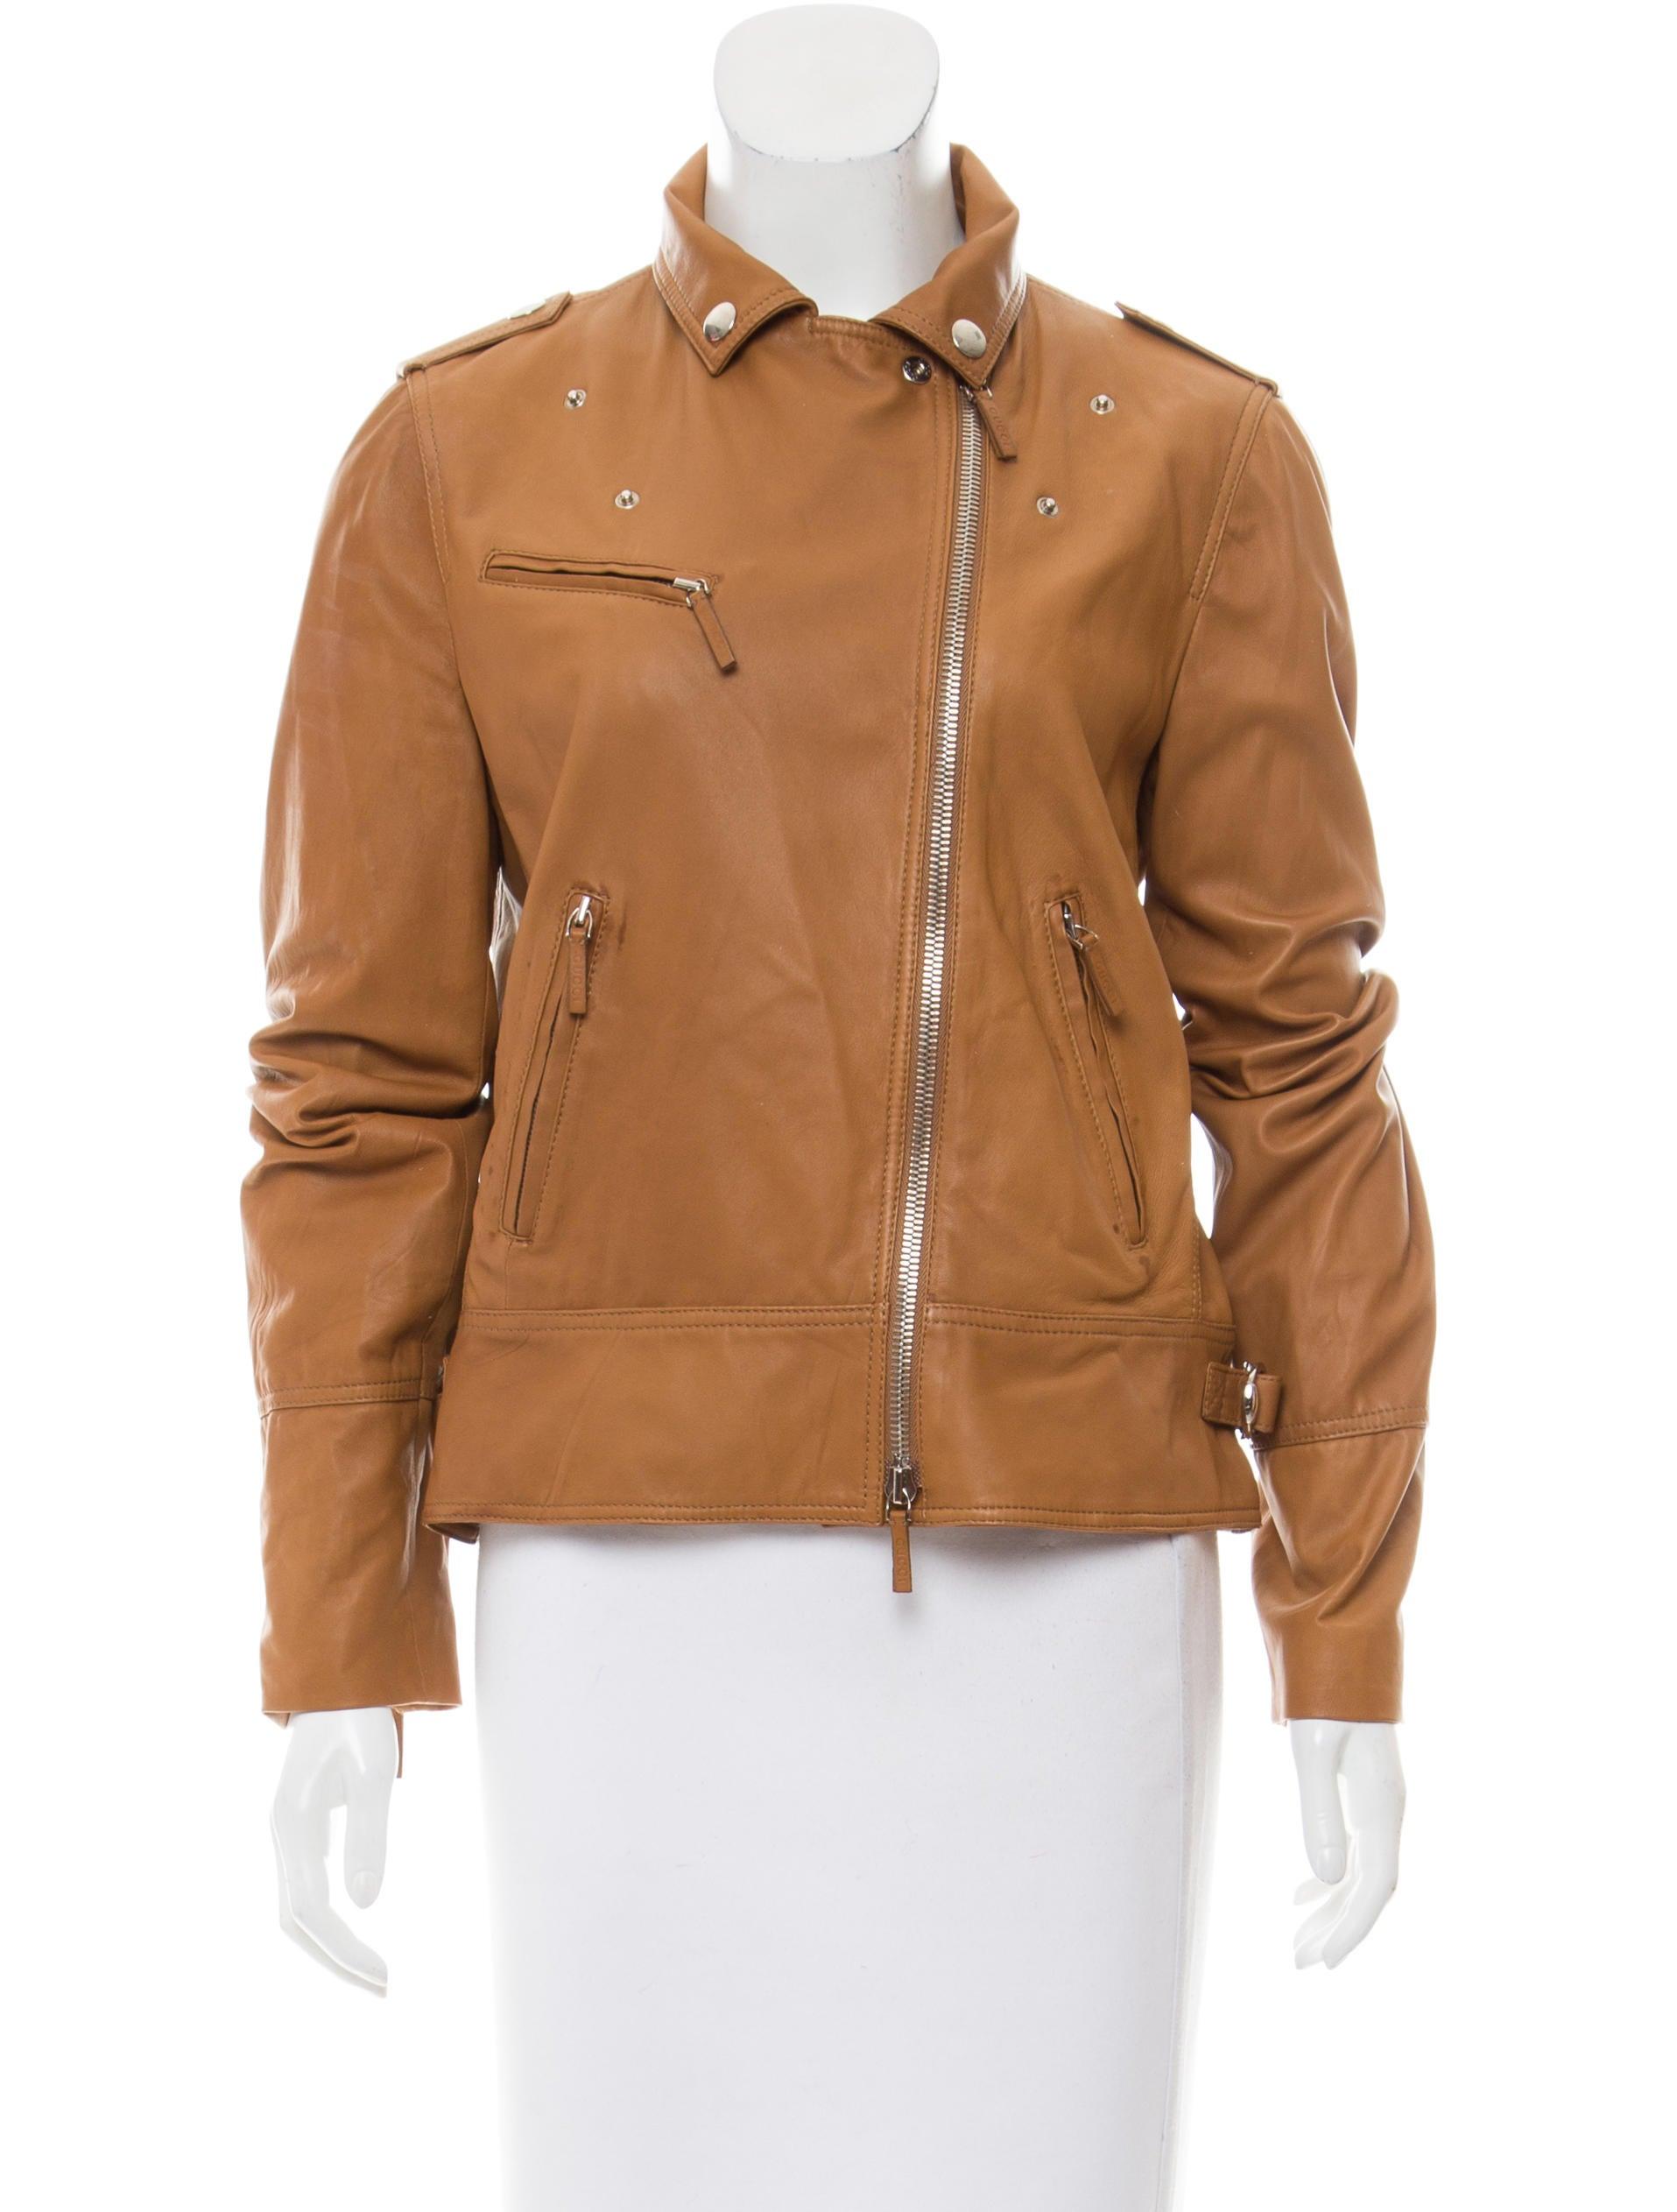 Leather jackets websites